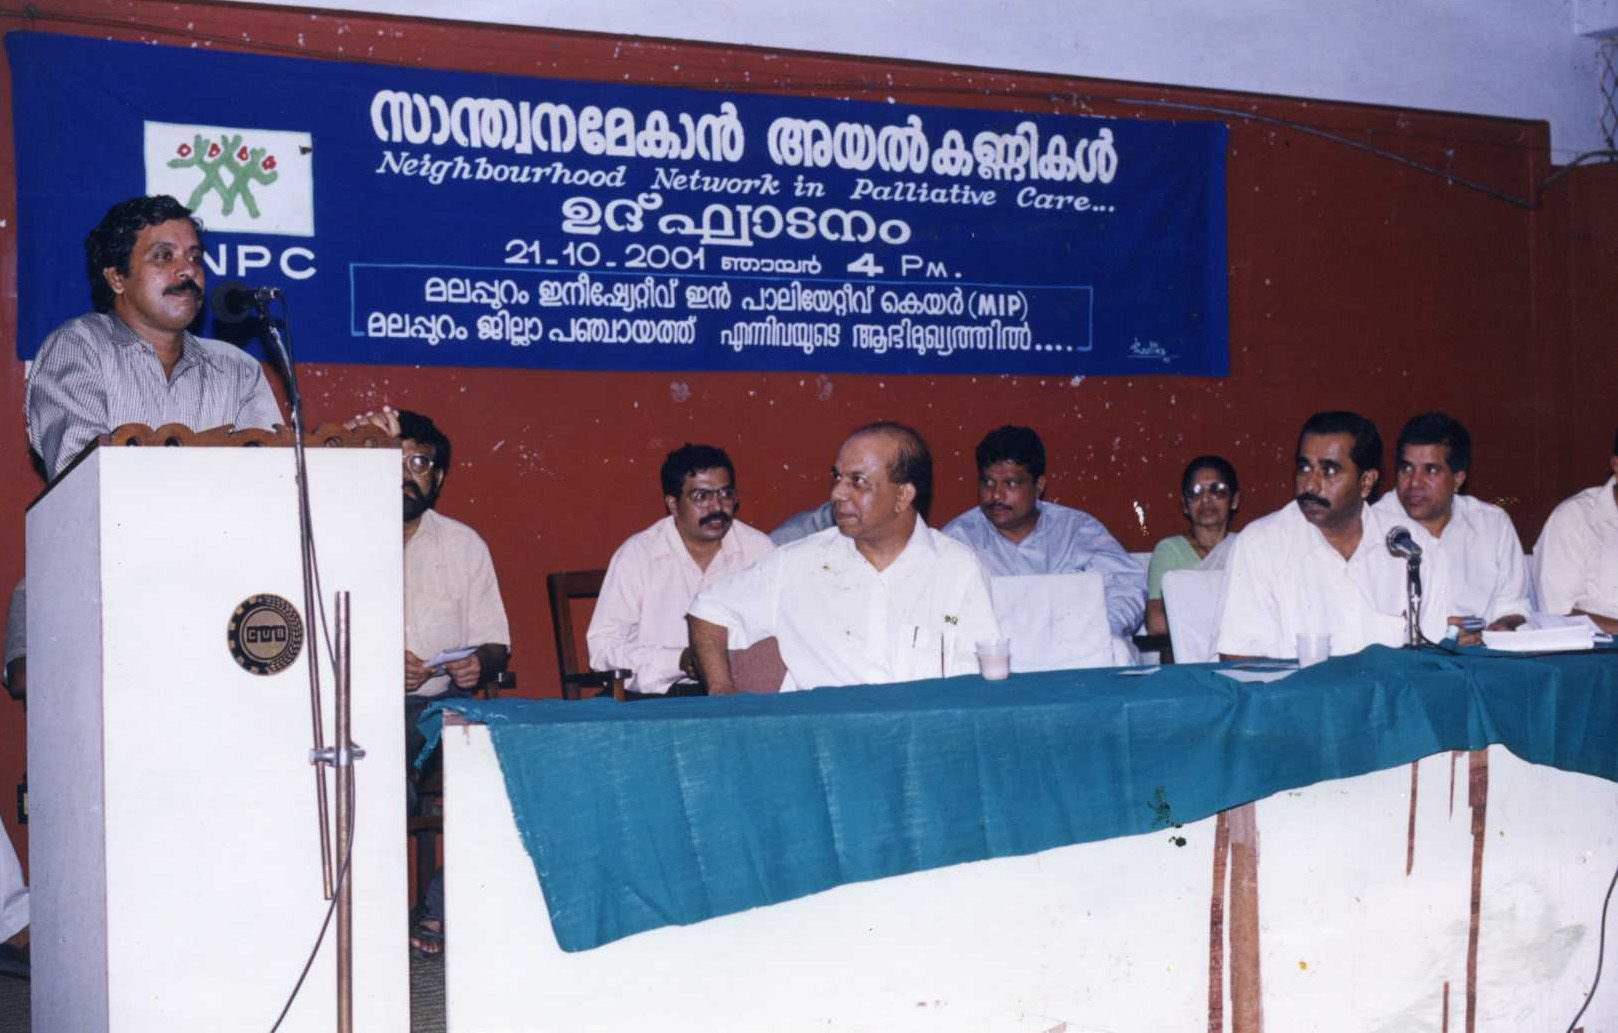 NNPC Inauguration 2001